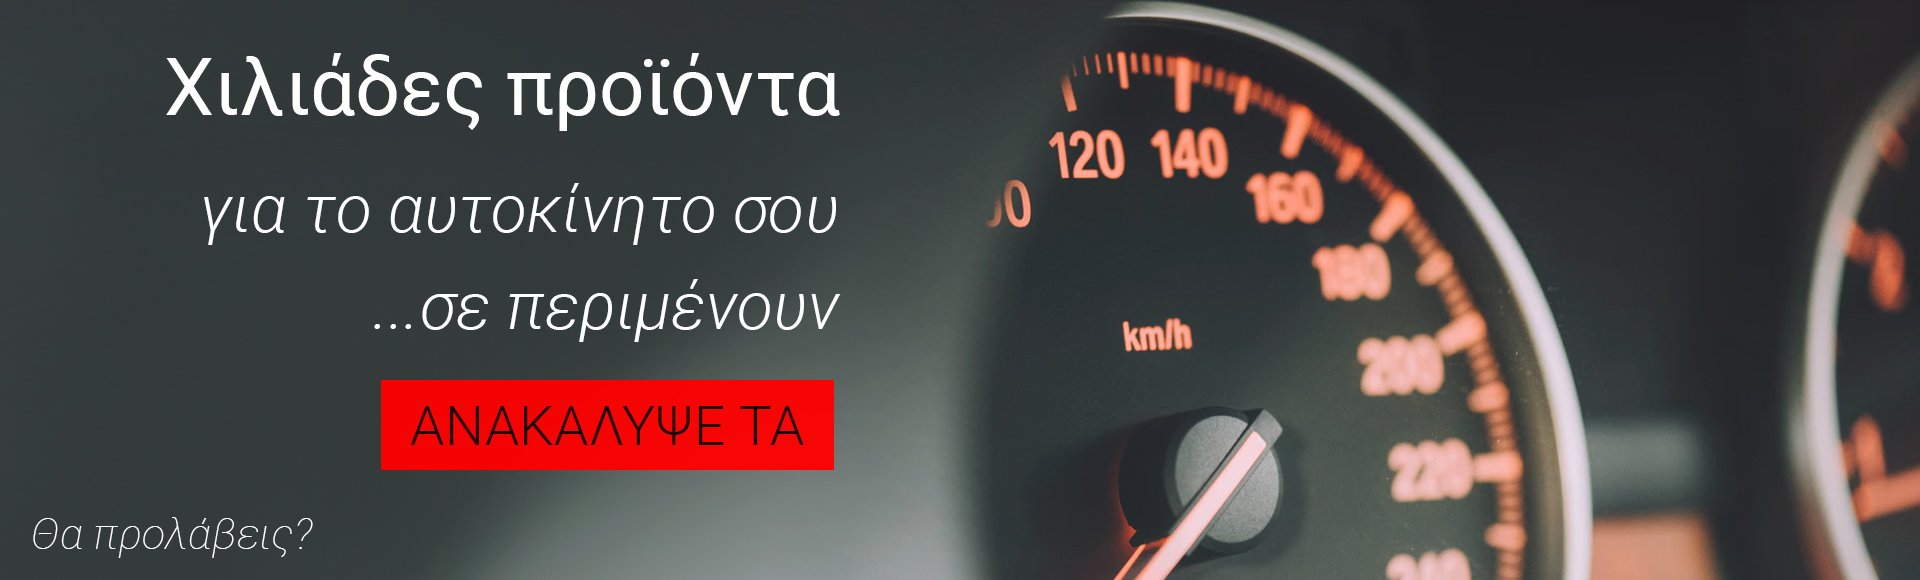 auto | elabstore.gr